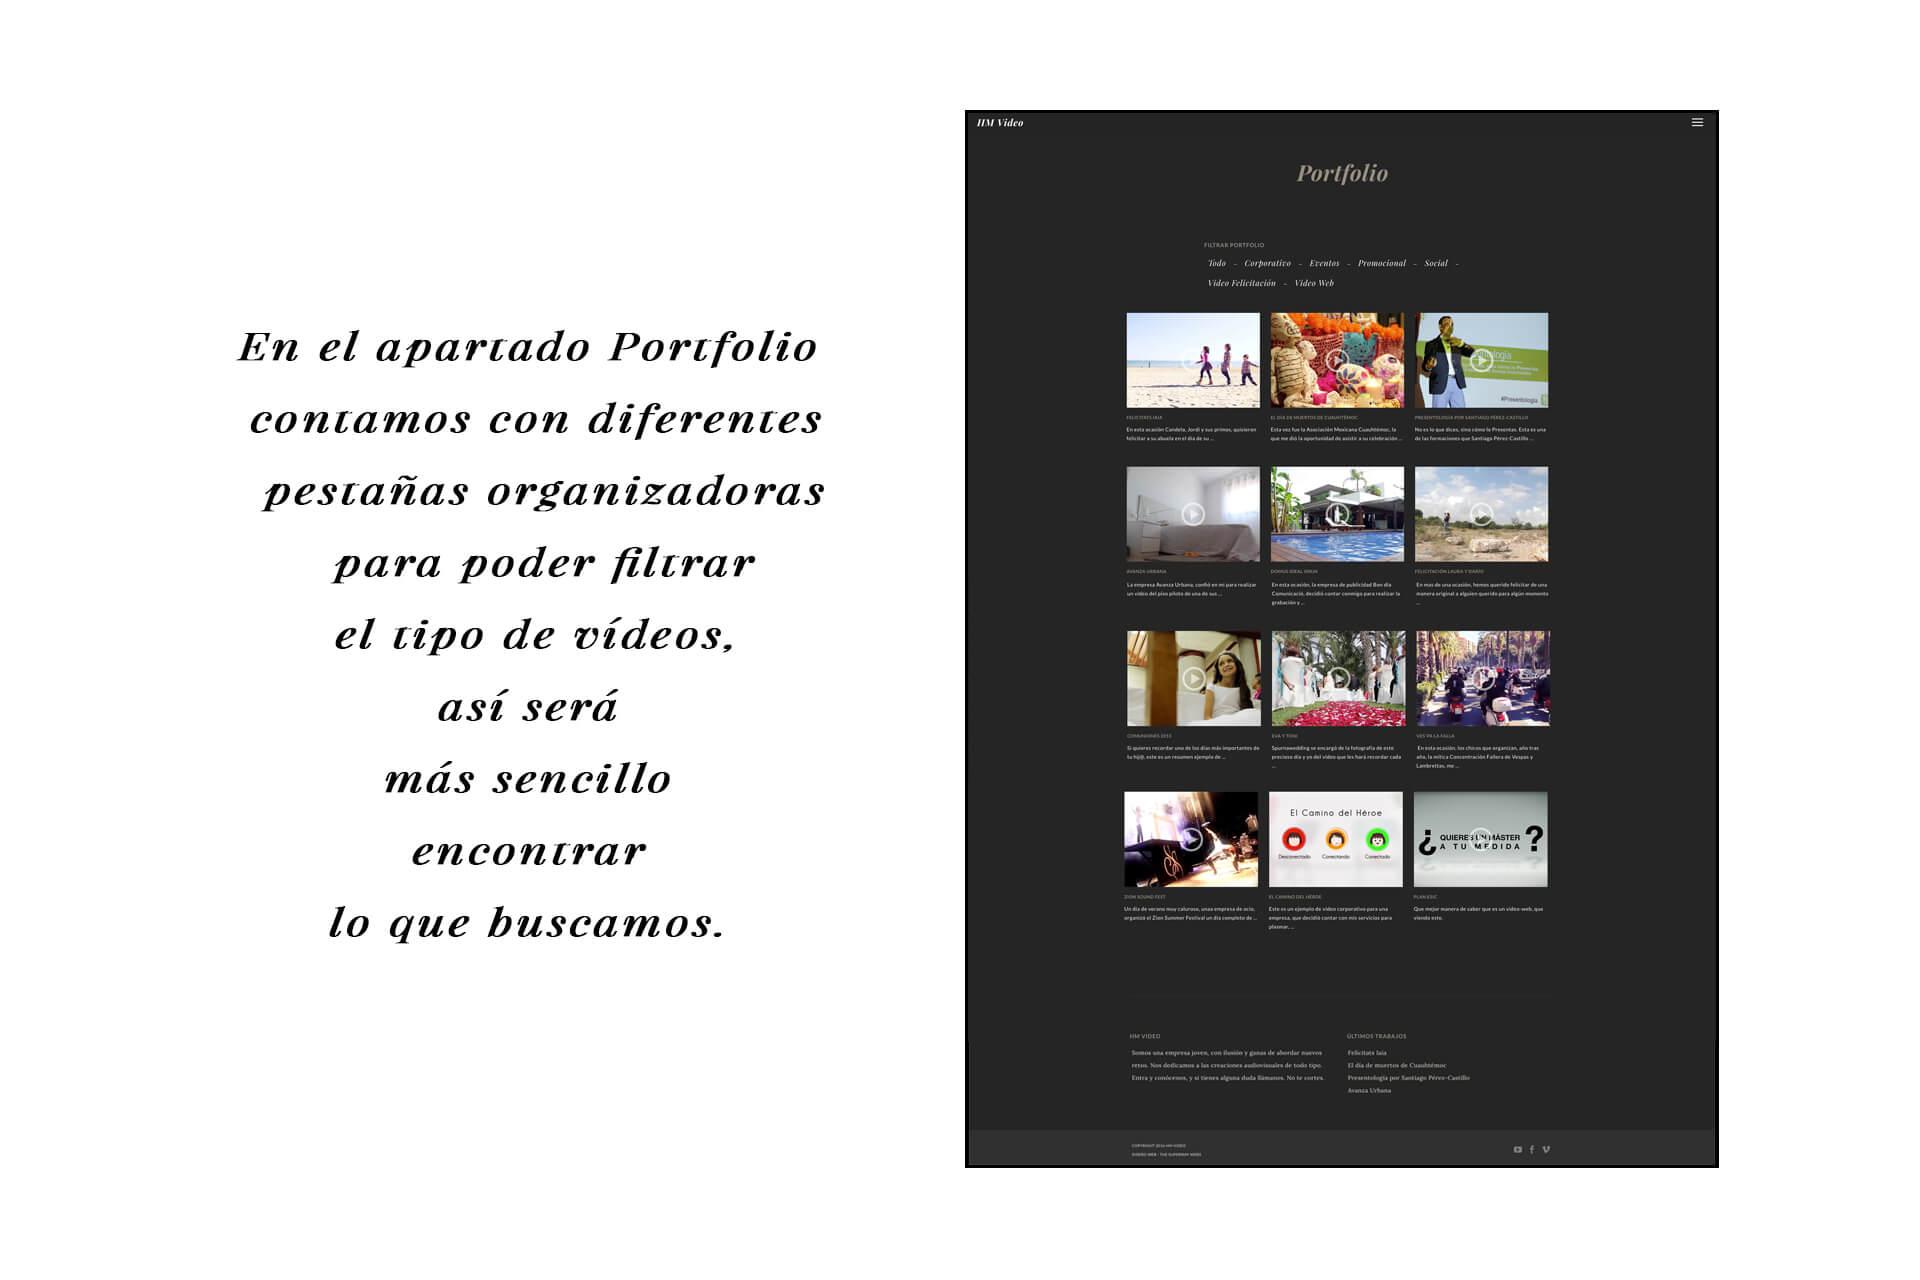 Página web HM Portfolio | The Superway Webs